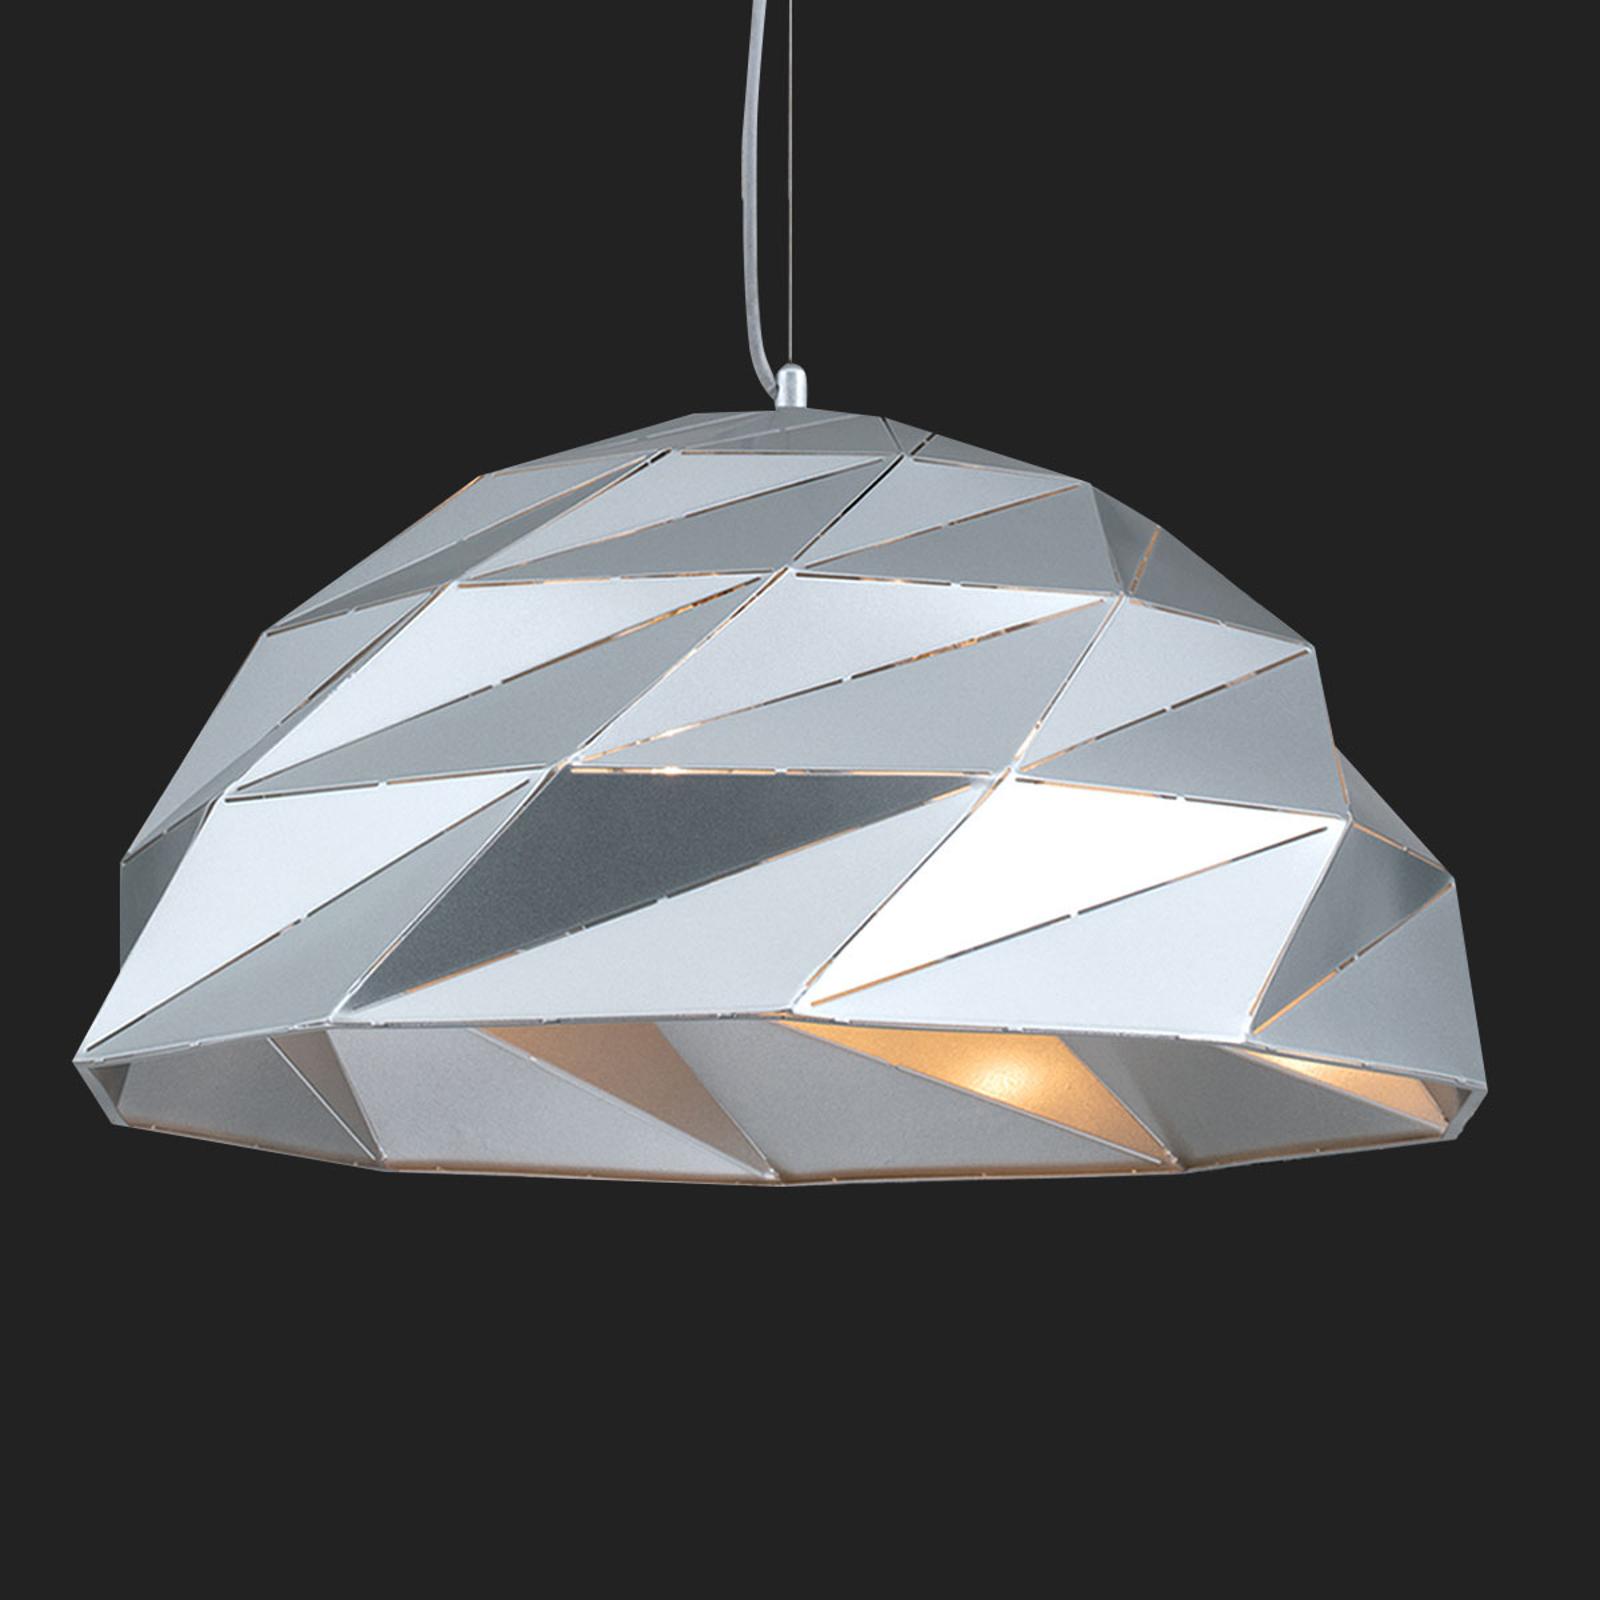 Lampa wisząca Origami Ø 56 cm srebrna